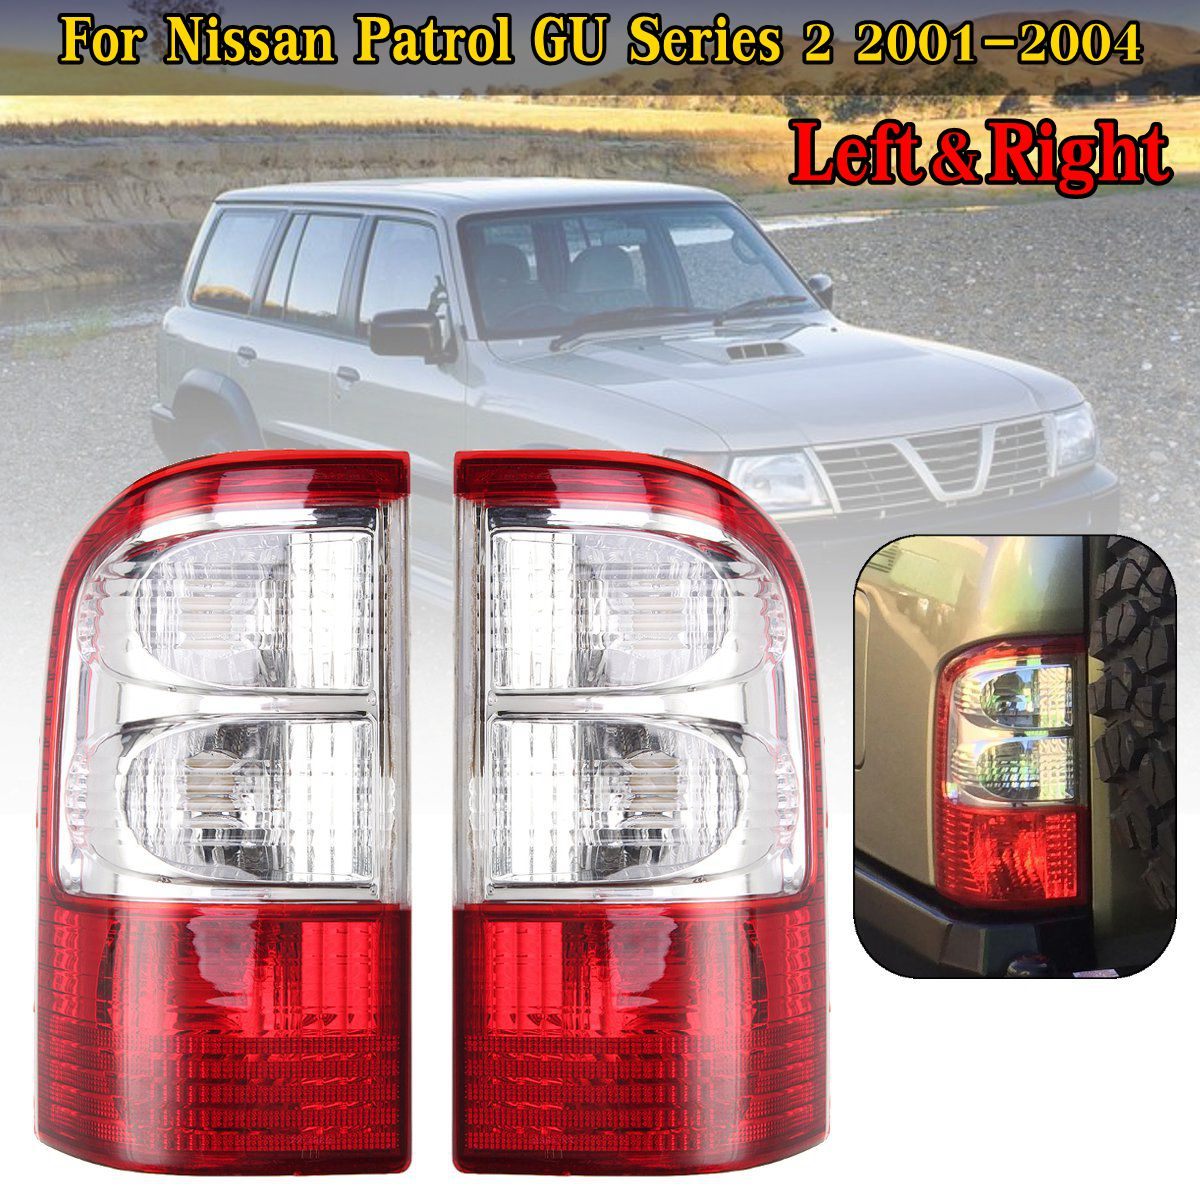 12 v rear tail light for nissan patrol gu series 2 2001 2002 2003 2004 brake